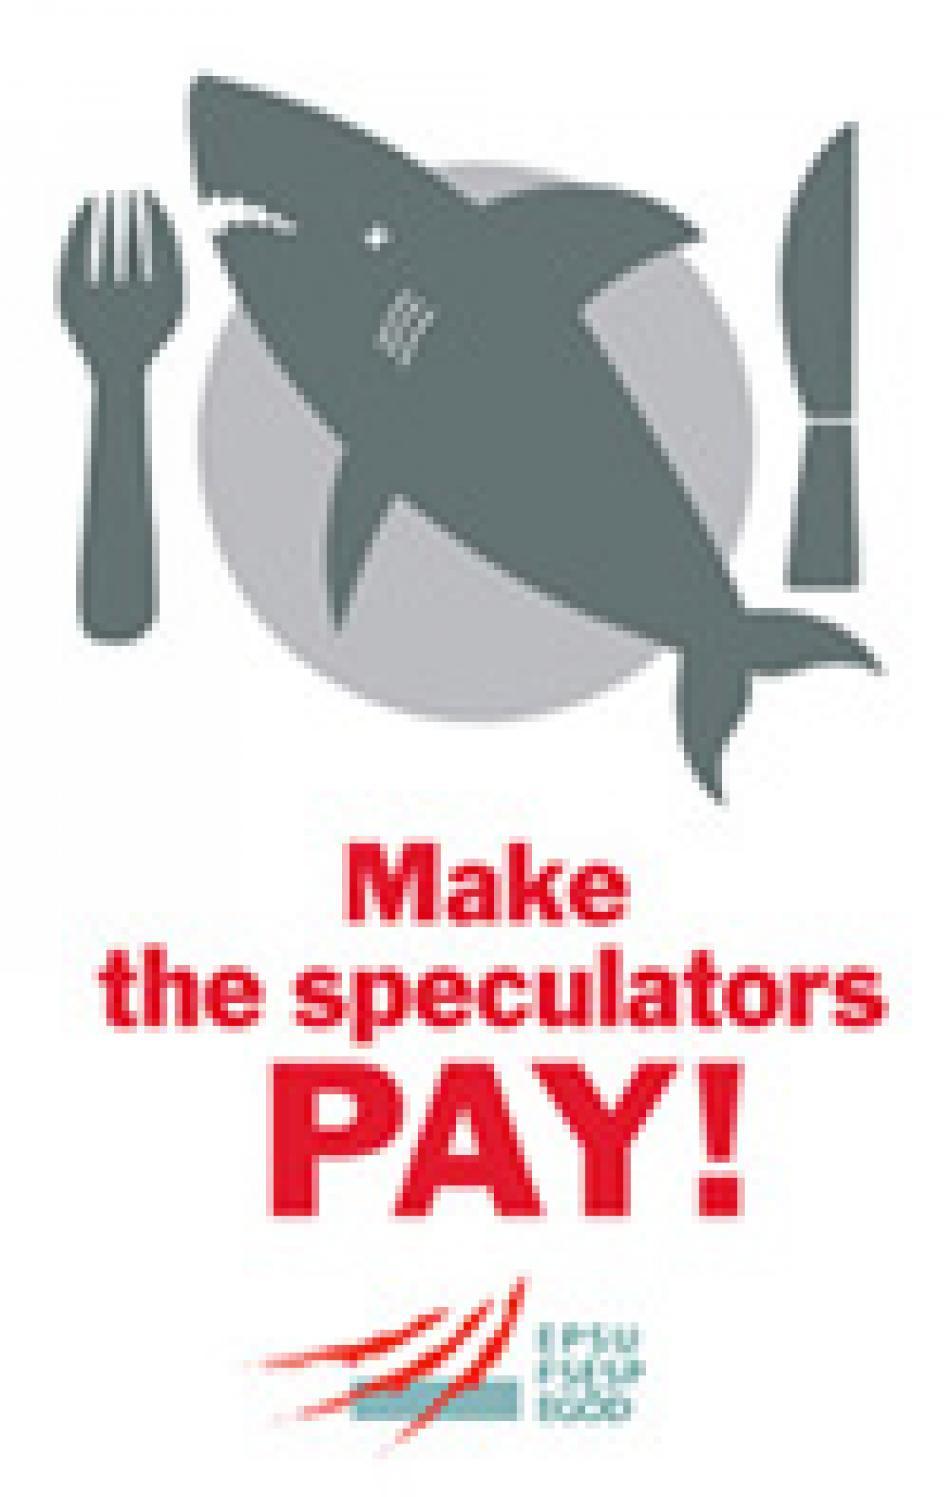 Speculators ok2 VERY small logo